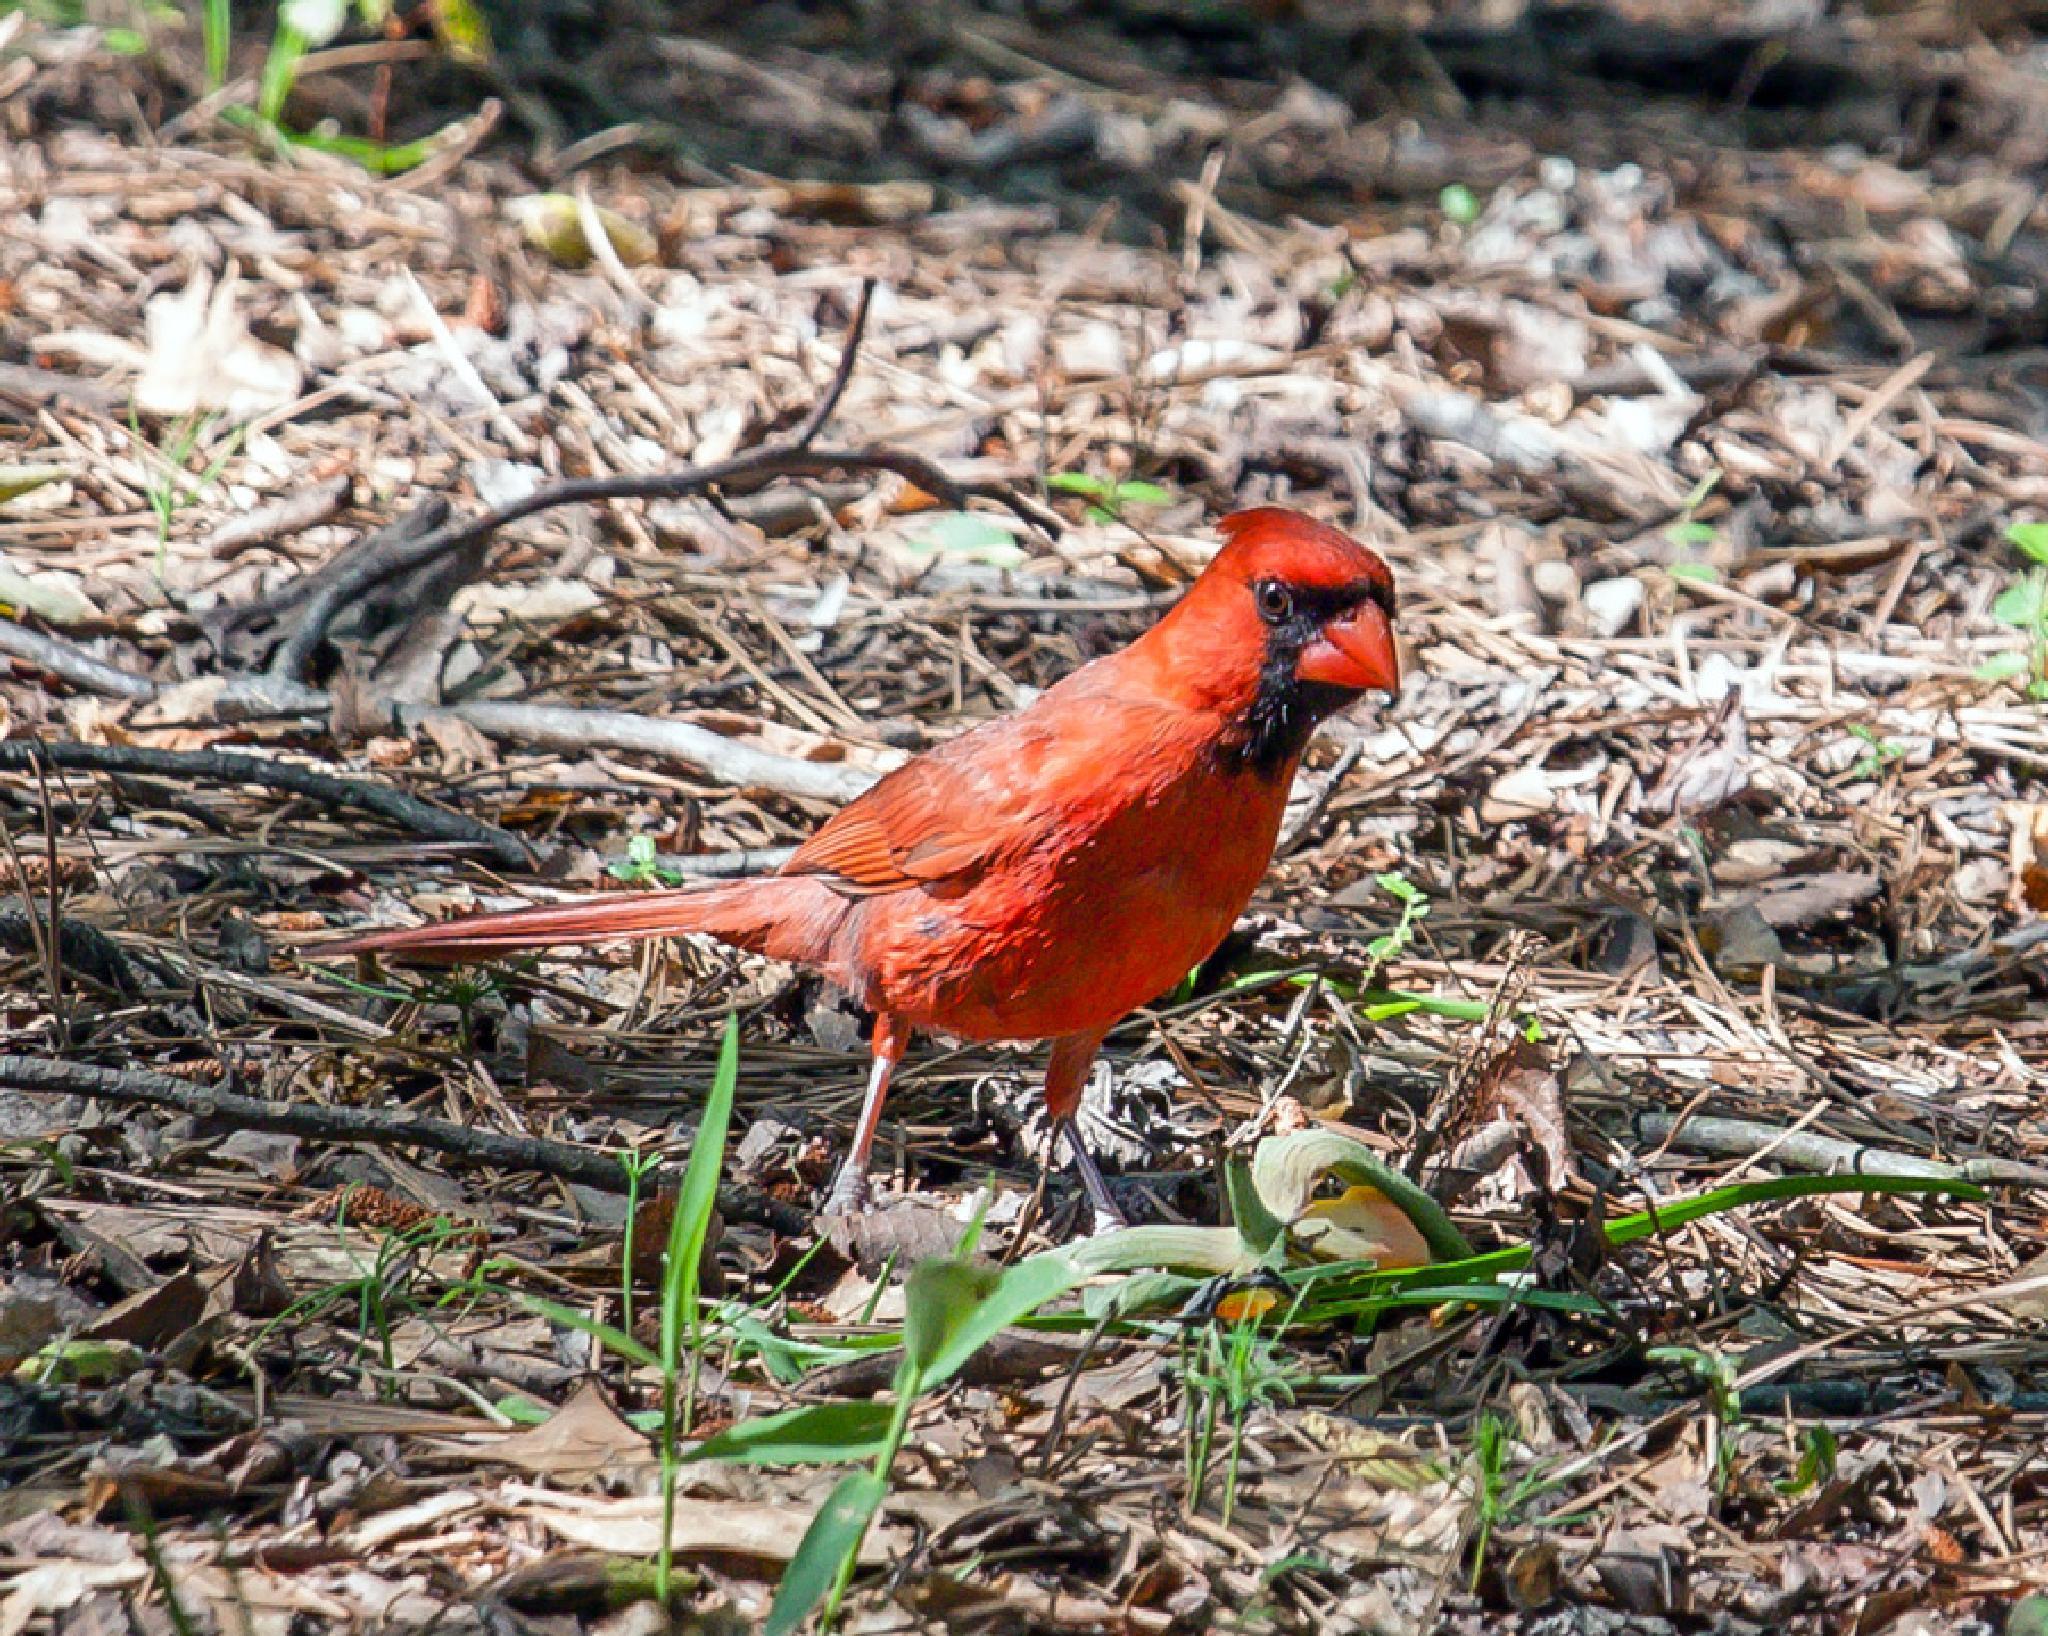 Regal Cardinal by blee